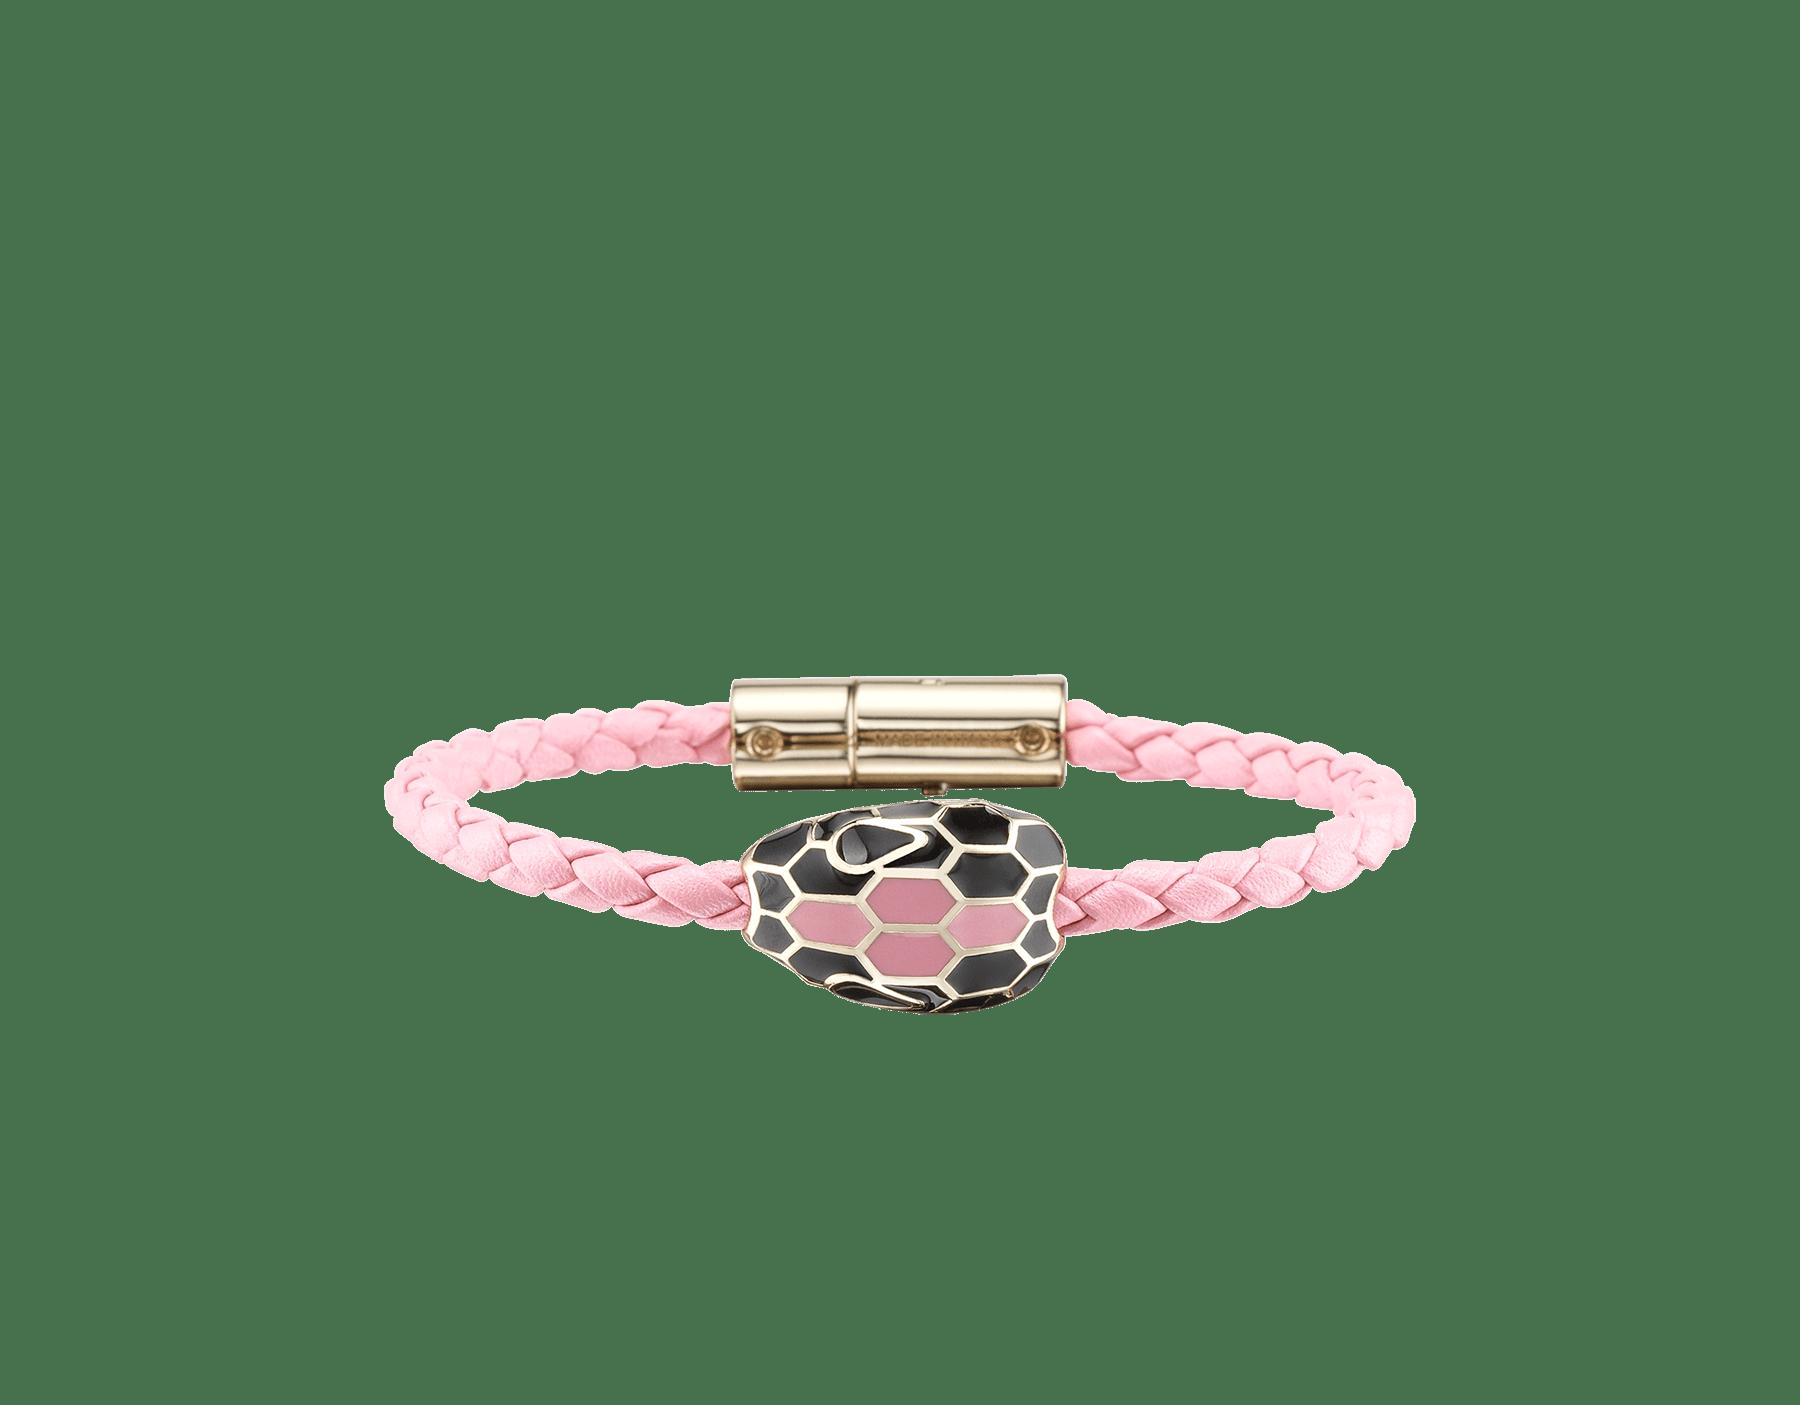 Serpenti Forever braid bracelet in flamingo quartz woven calf leather with an iconic snakehead décor in black and flamingo quartz enamel. SerpBraid-WCL-FQ image 1